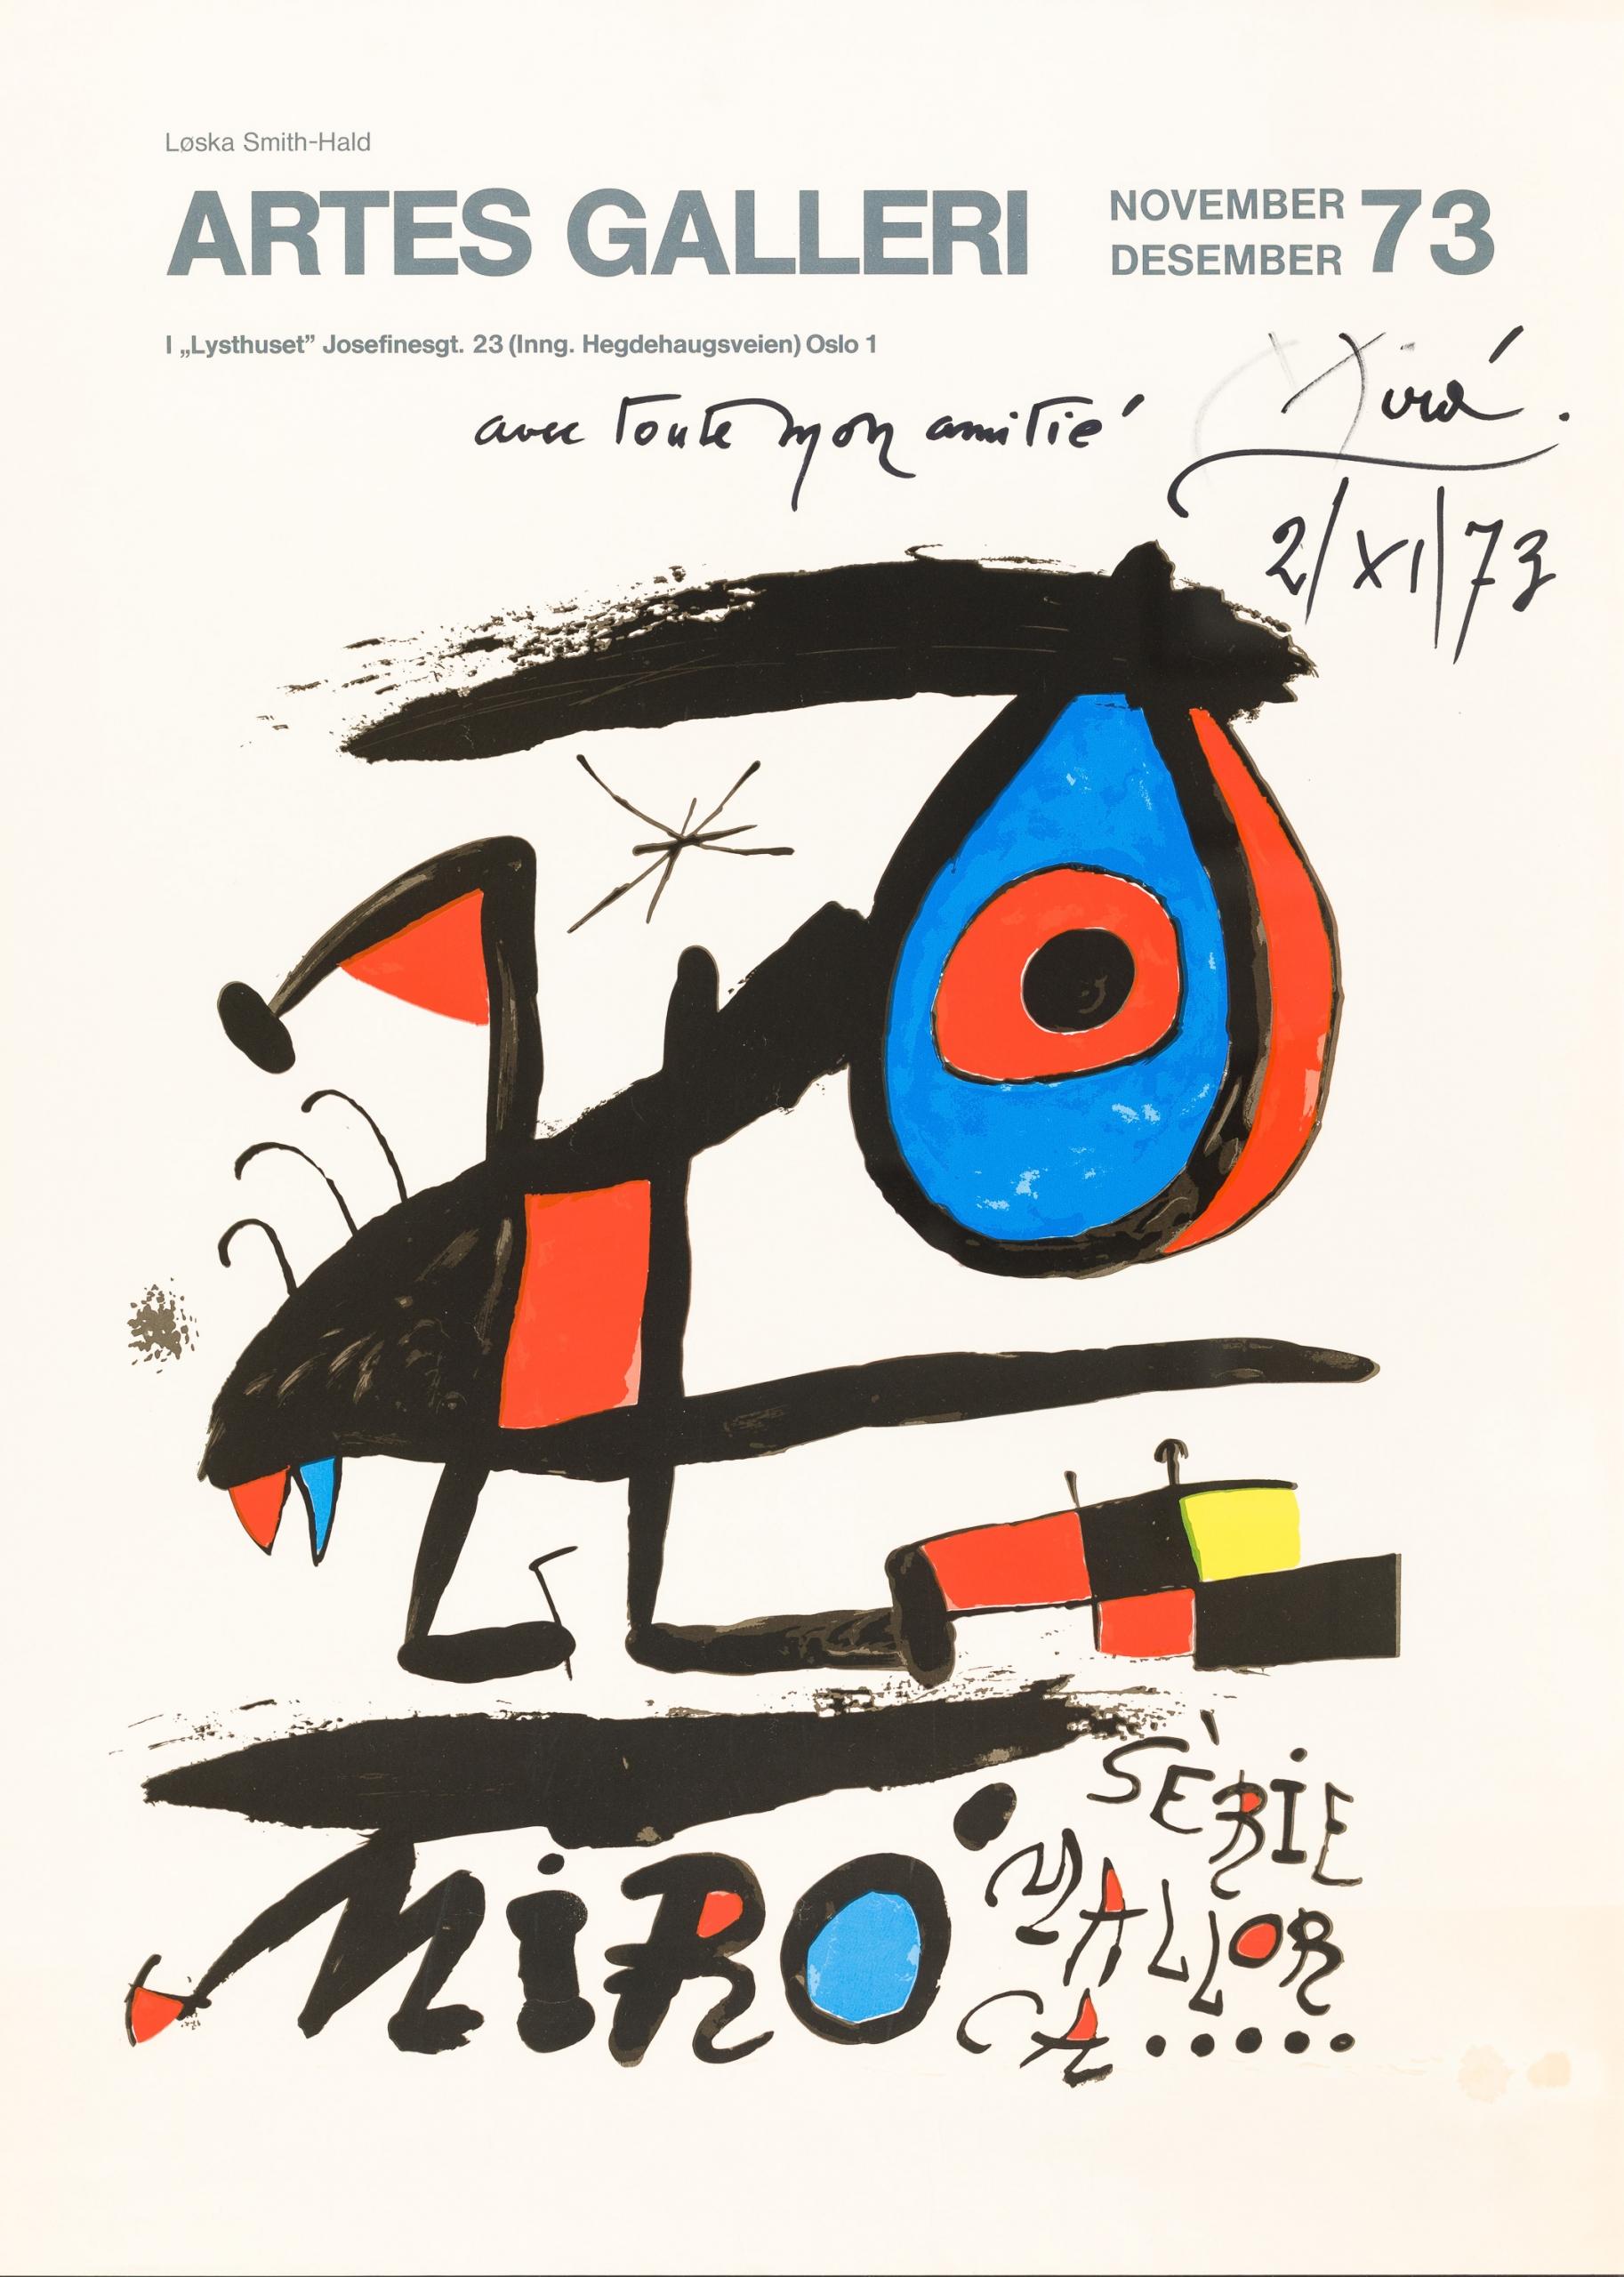 Joàn Miró, Sèrie Mallorca - Ausstellungsplakat (Artes Galleri, Oslo 1973)